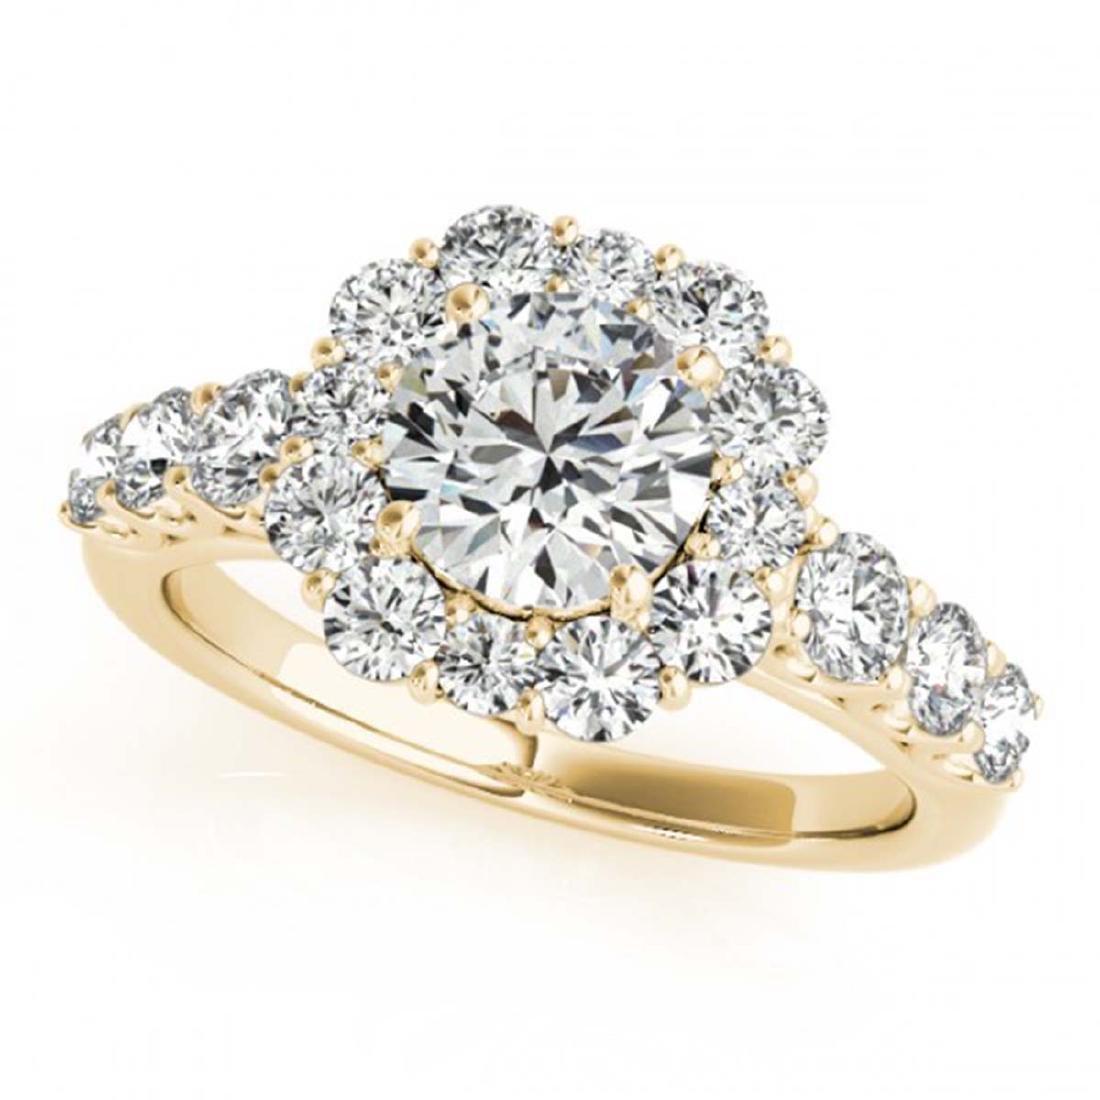 2.25 ctw VS/SI Diamond Halo Ring 18K Yellow Gold -